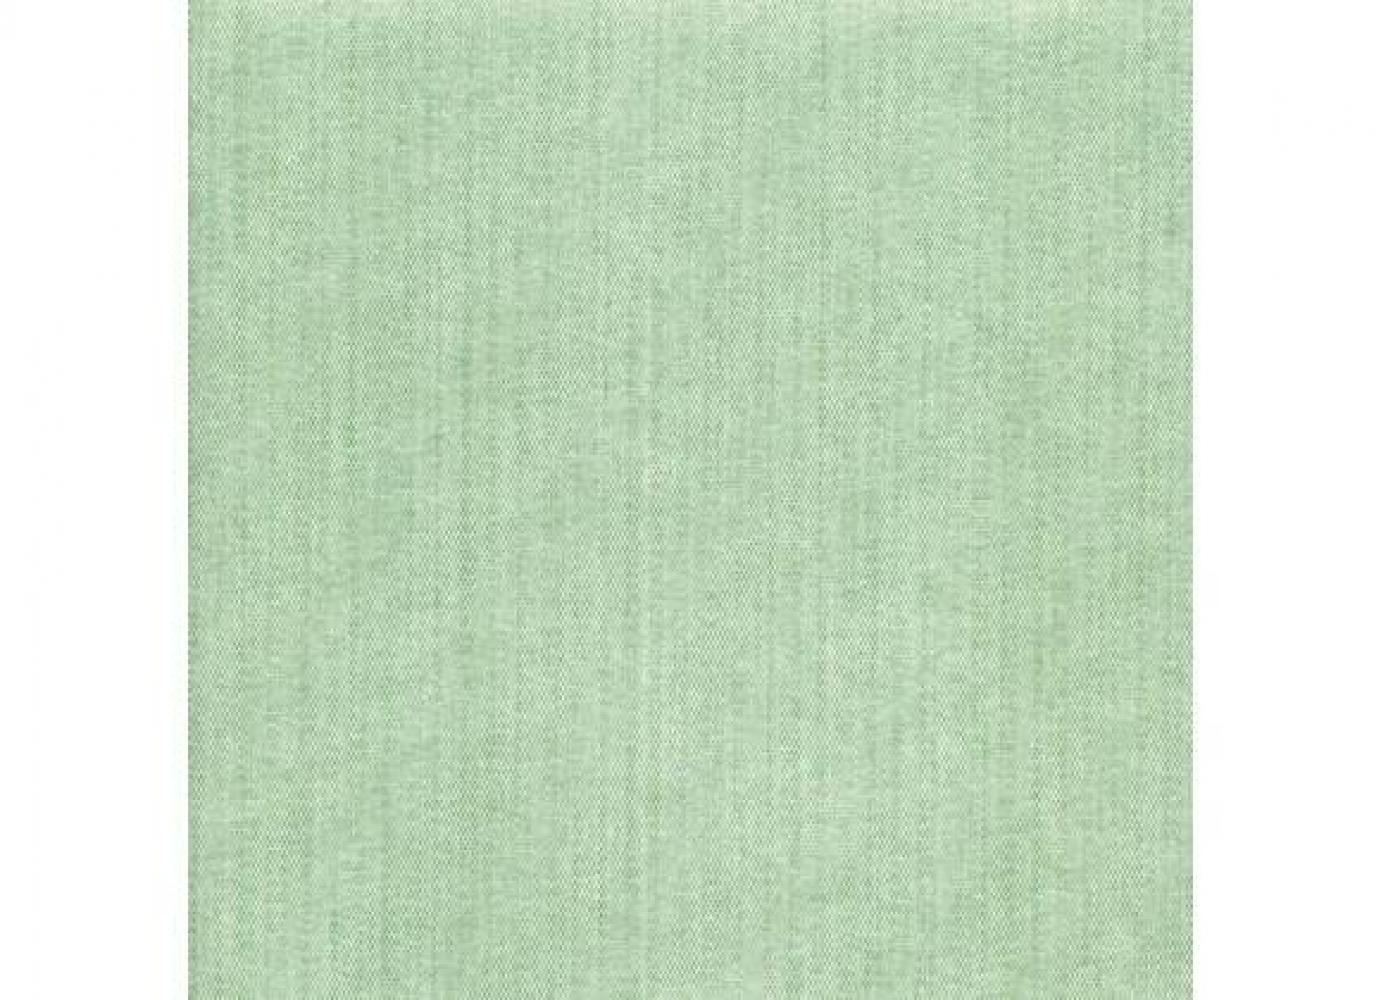 Acquista 100 Pezzi Coprimacchia Spun 17545749 | Glooke.com